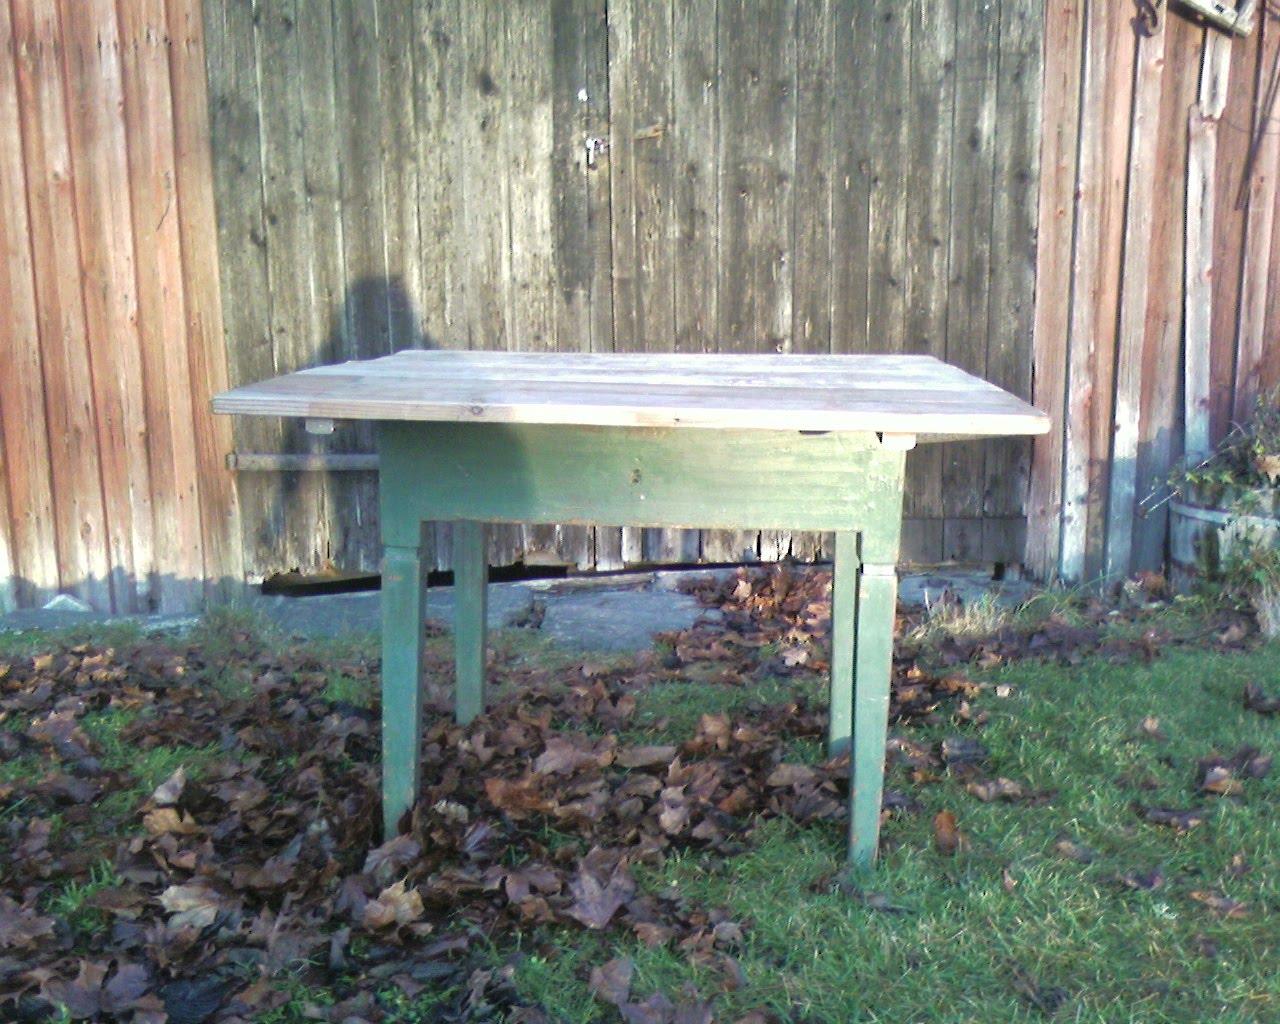 Rustikt Koksbord :  loda  Gammalt Koksbord Butik lanthandeln gammalt rustikt matbord i